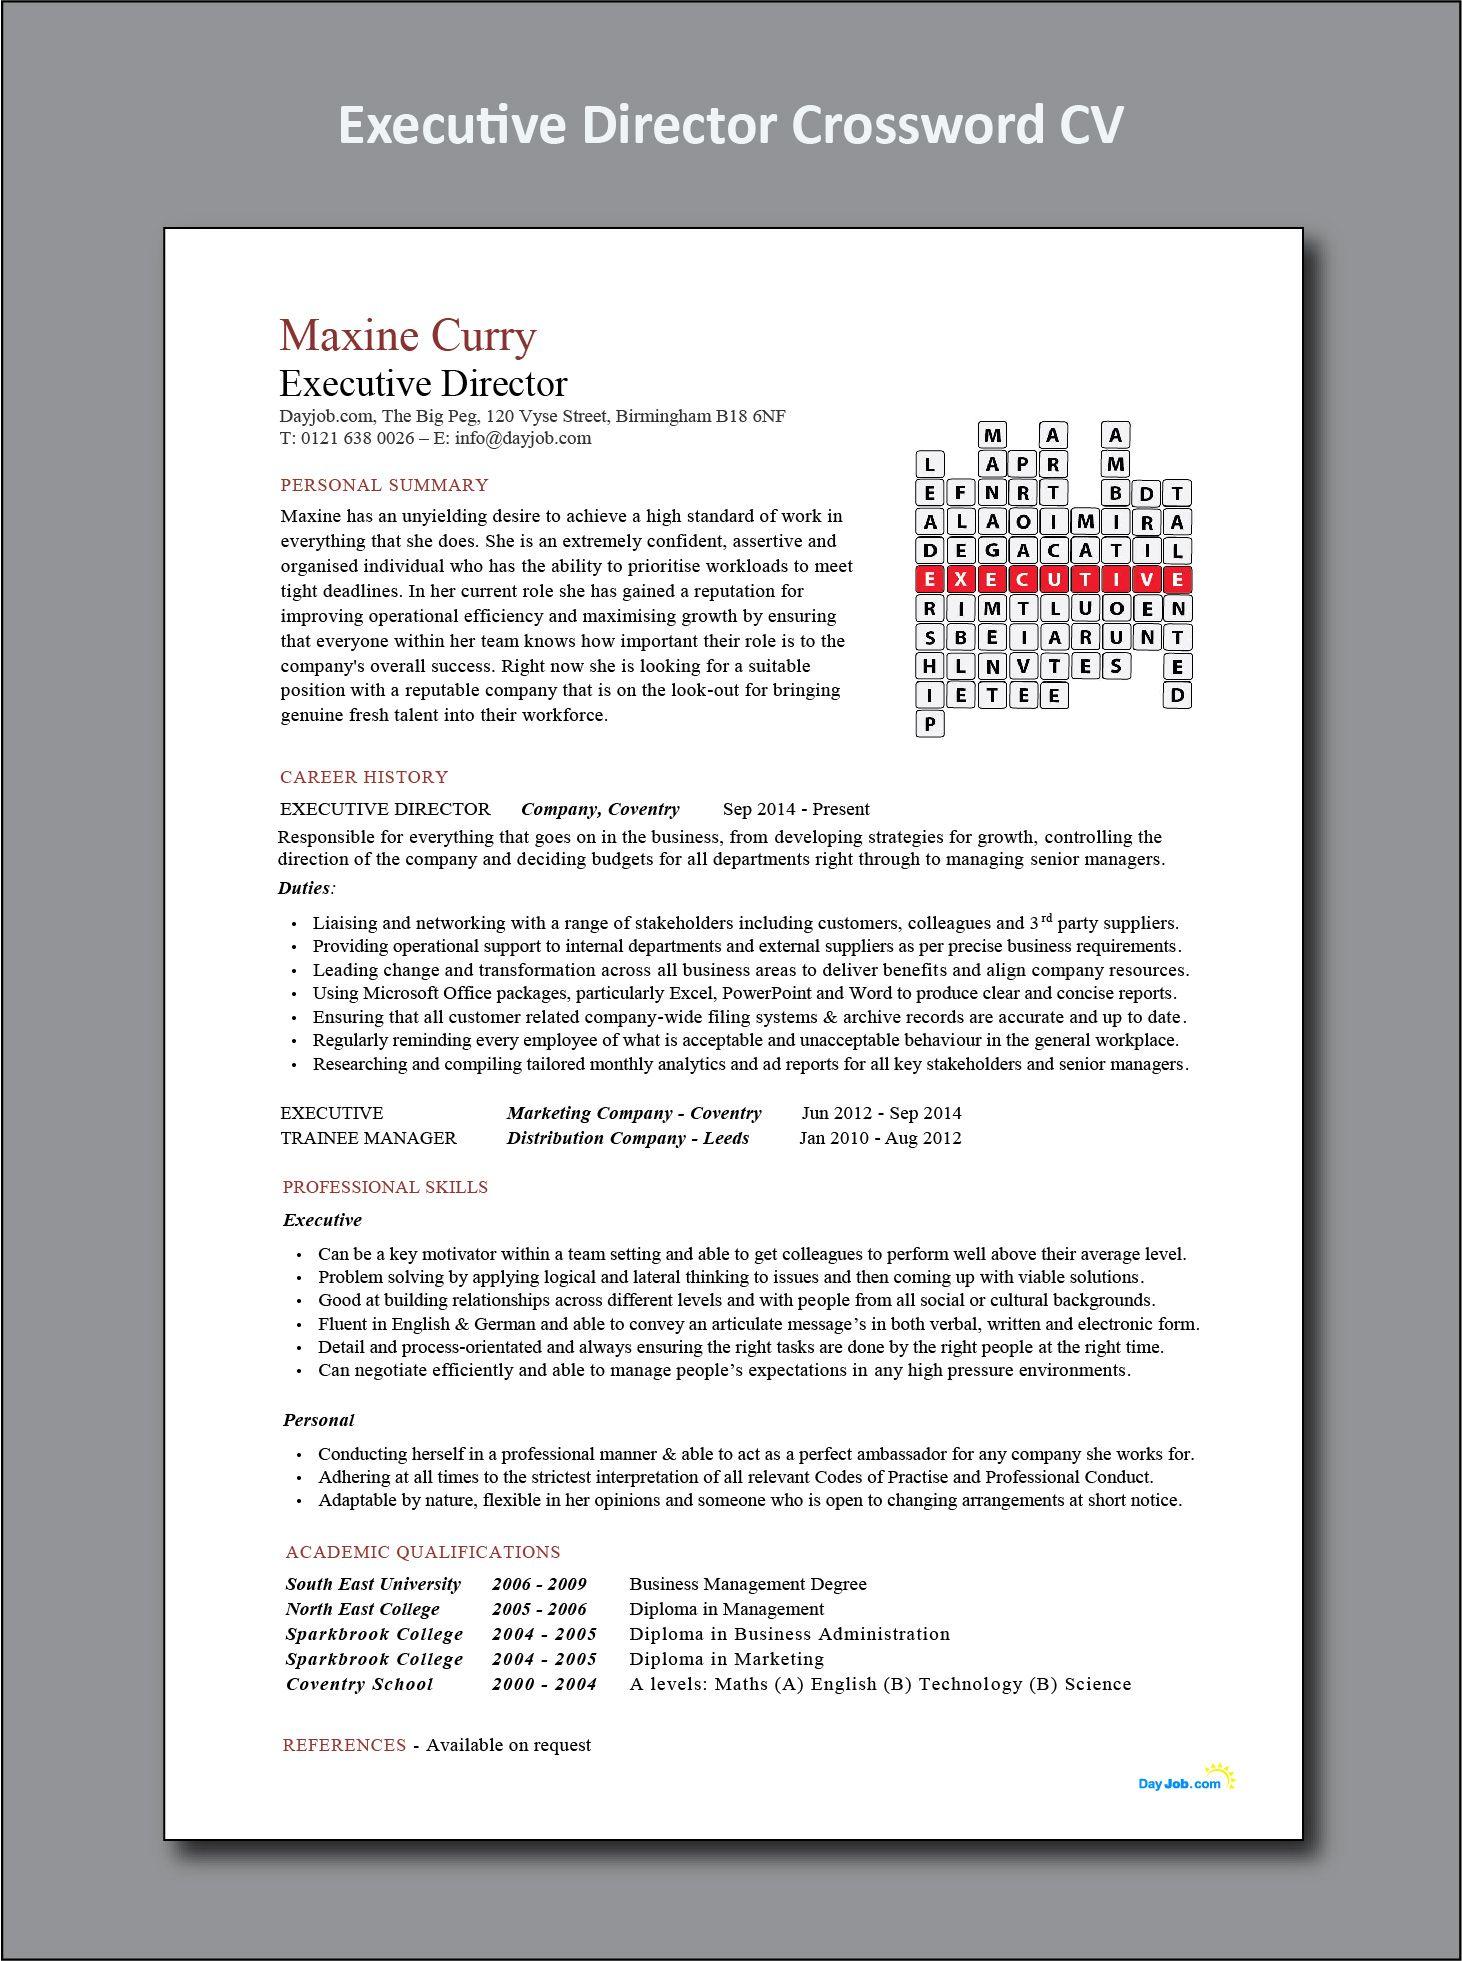 executive director crossword cv  resume  functional